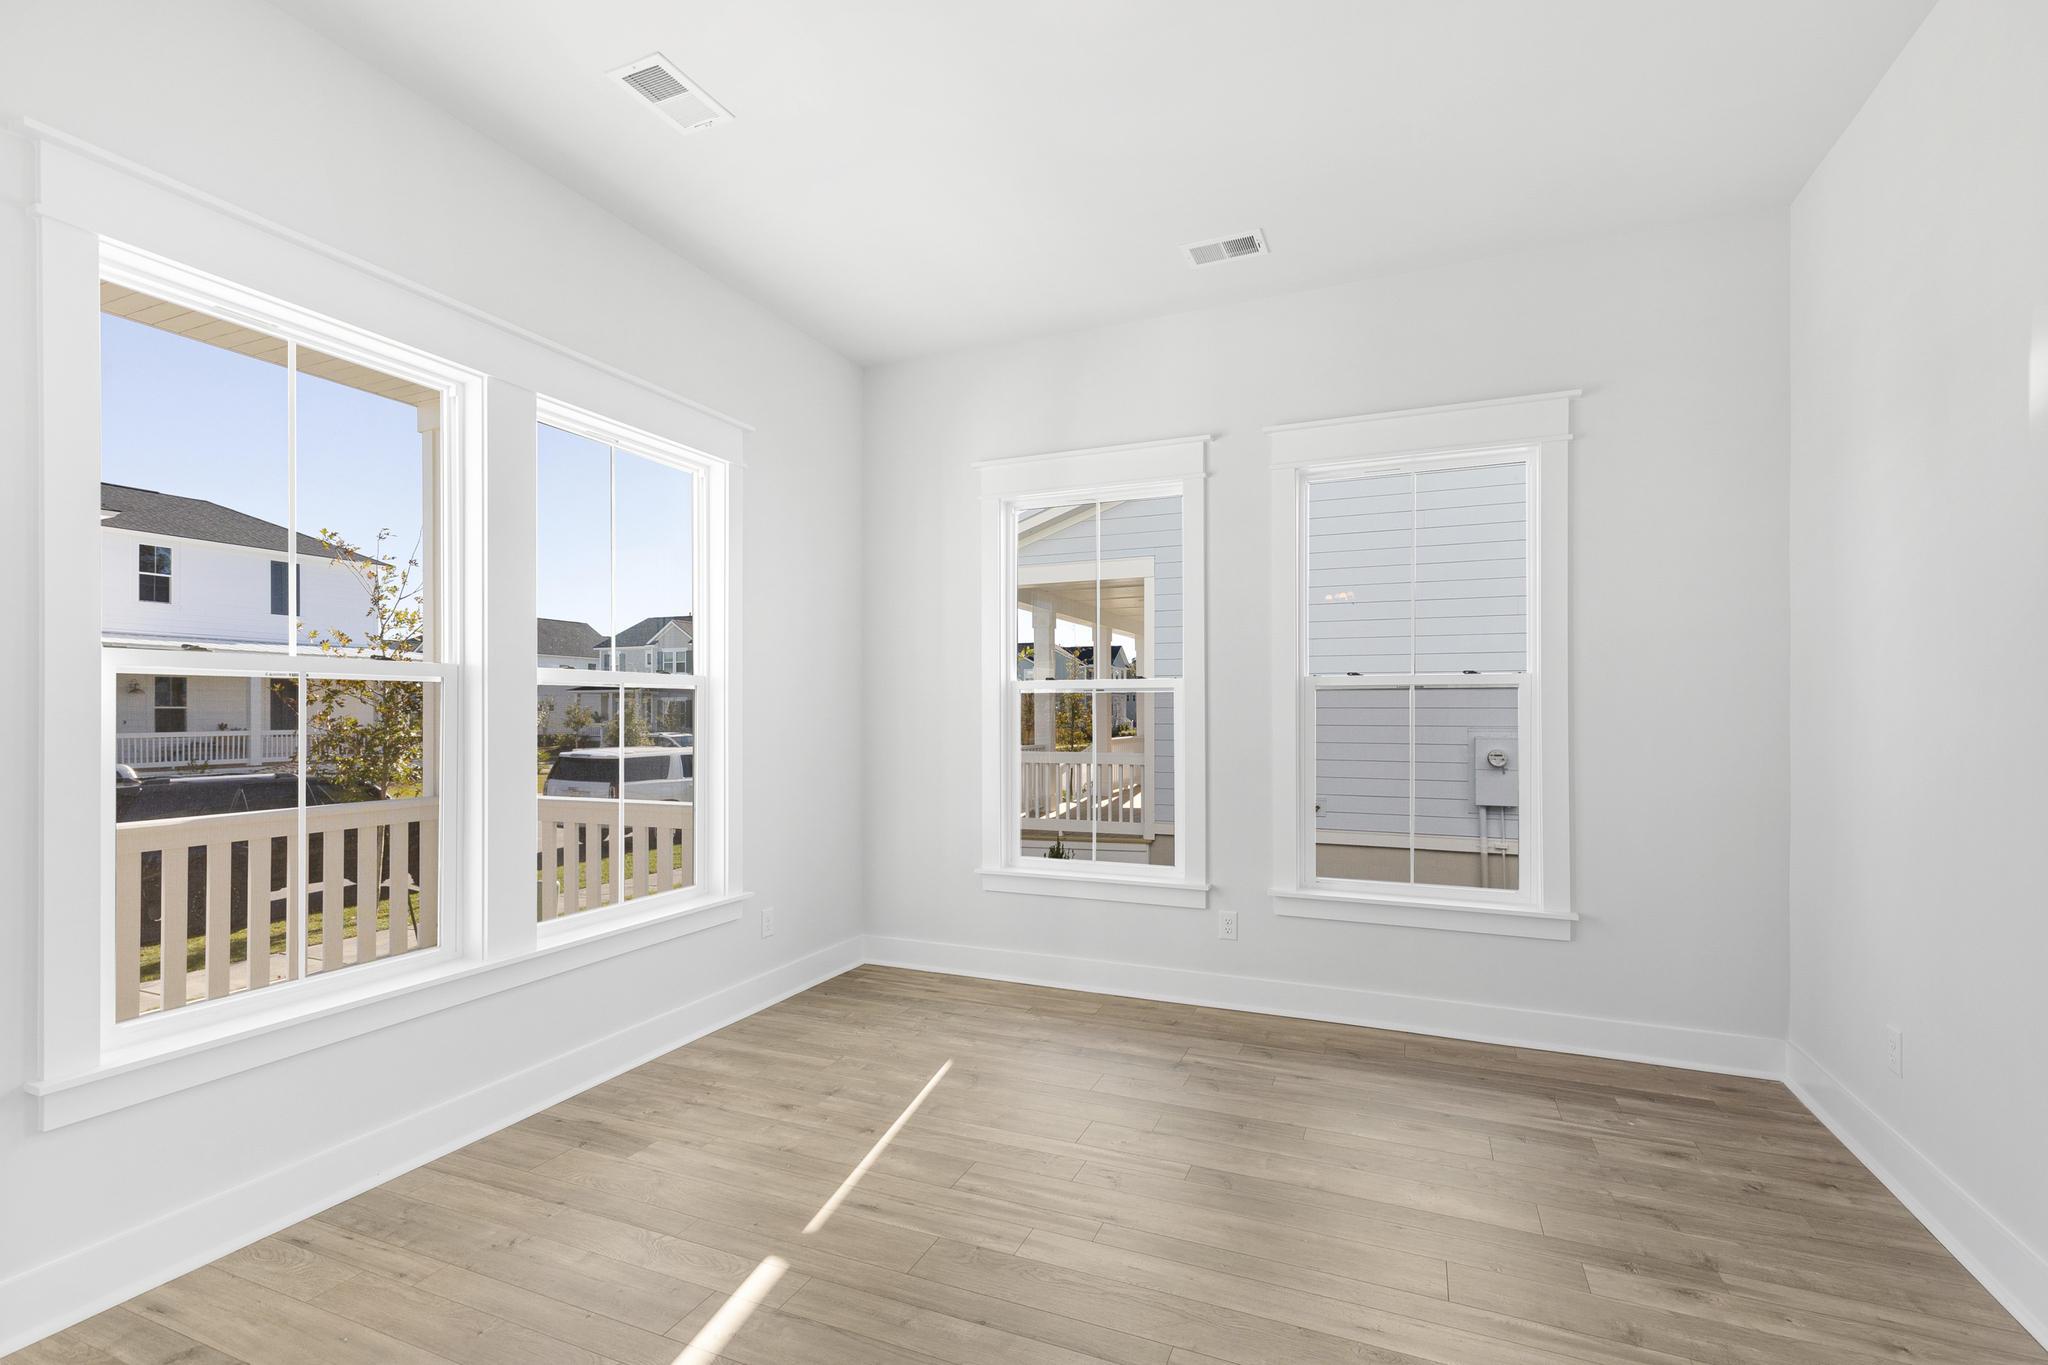 Carolina Park Homes For Sale - 1766 Sandy Brook, Mount Pleasant, SC - 5